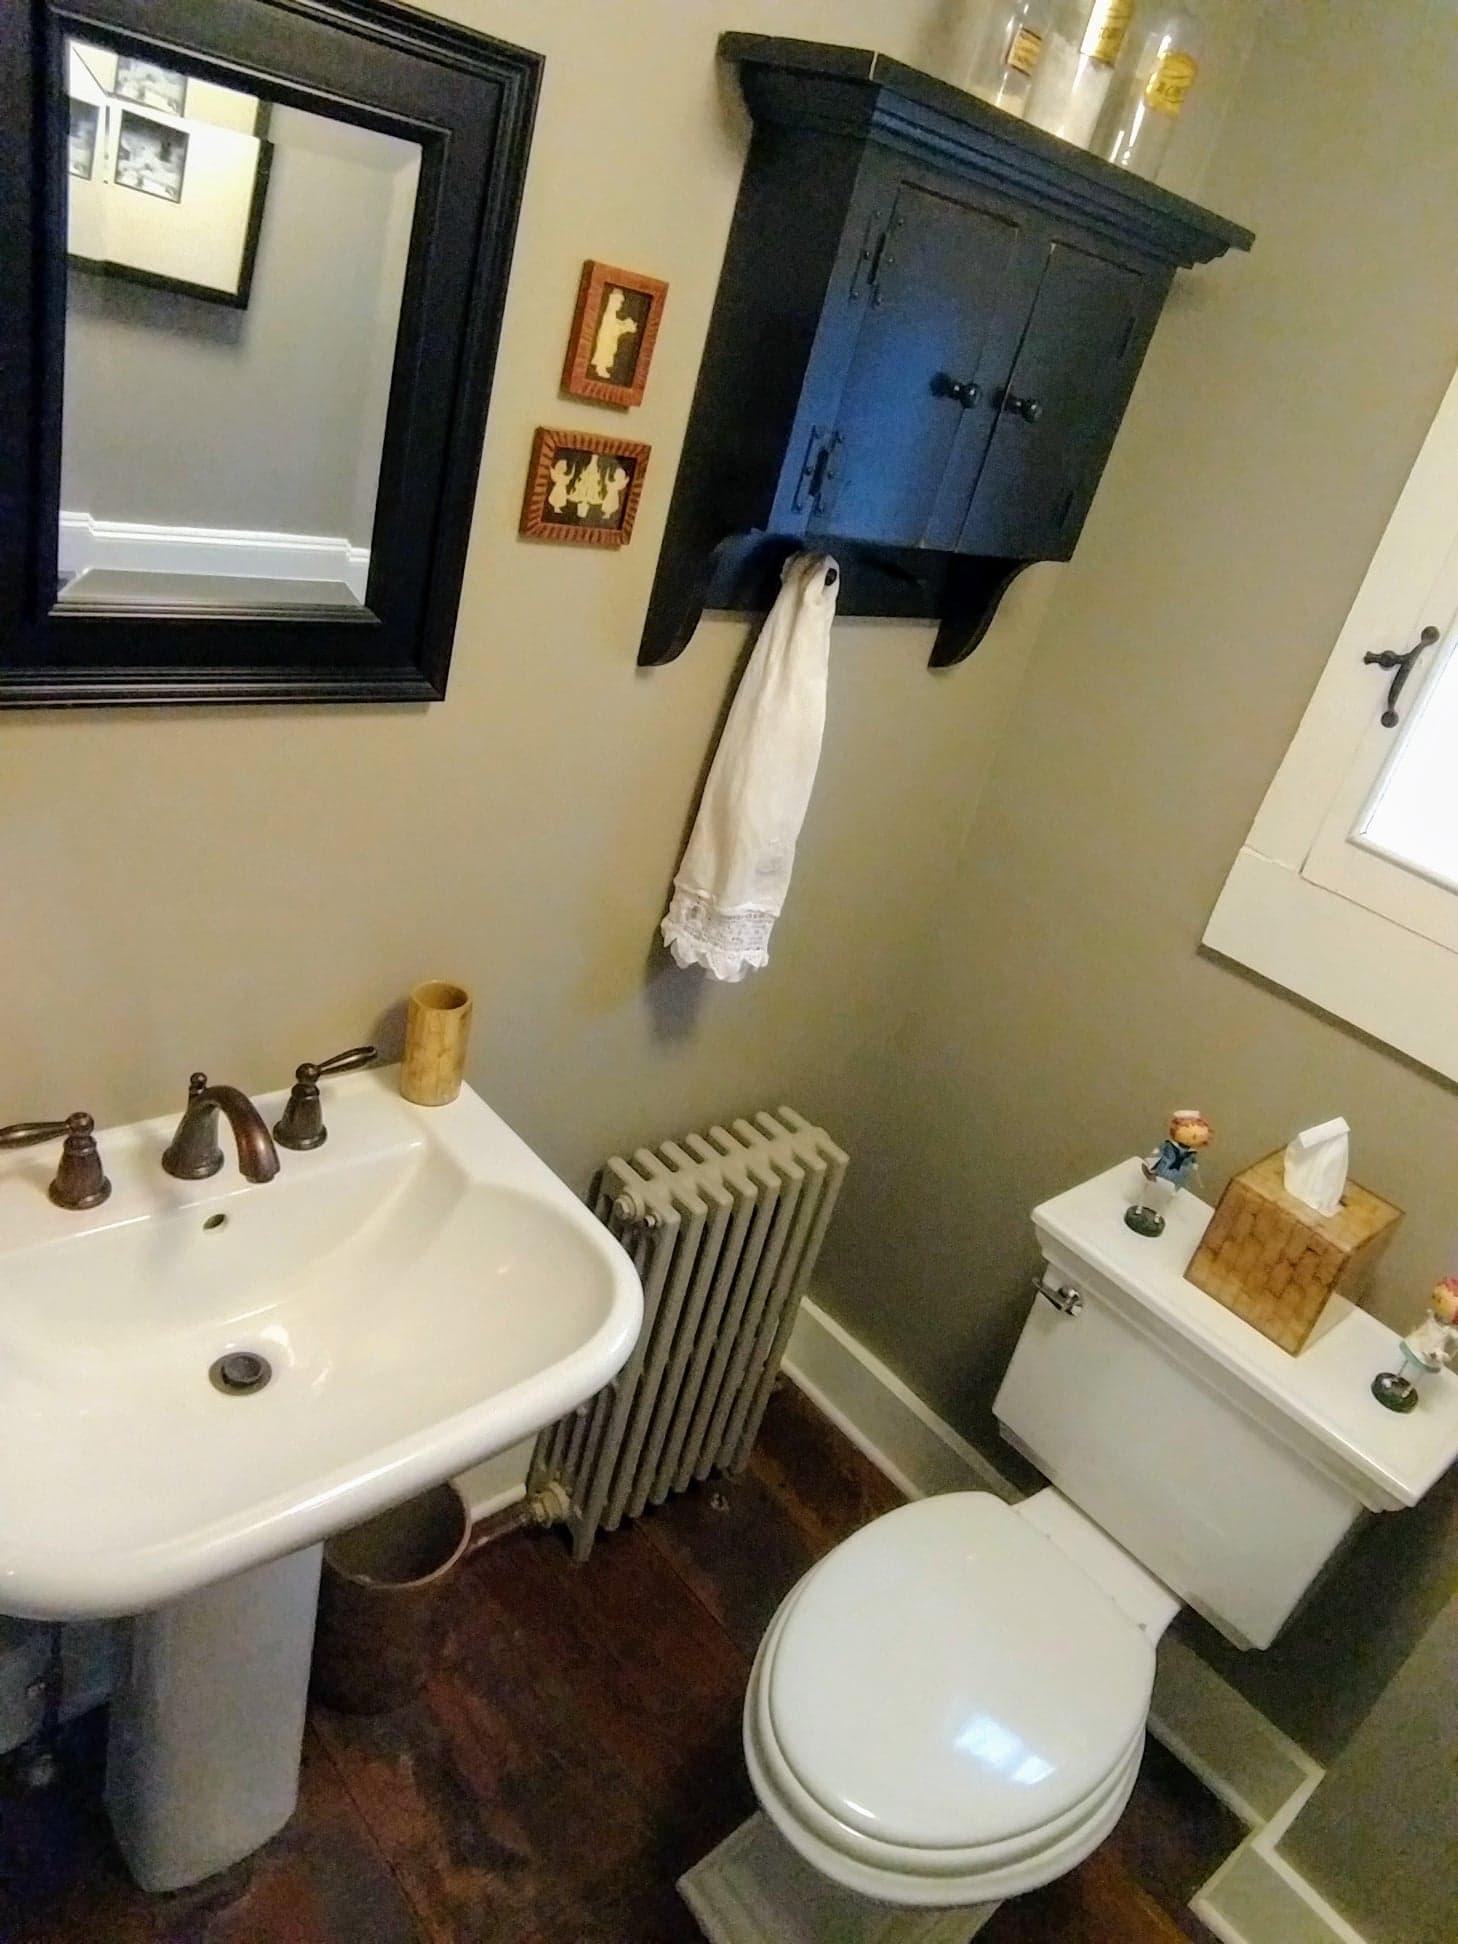 Half Bath - Sink, Cabinet and